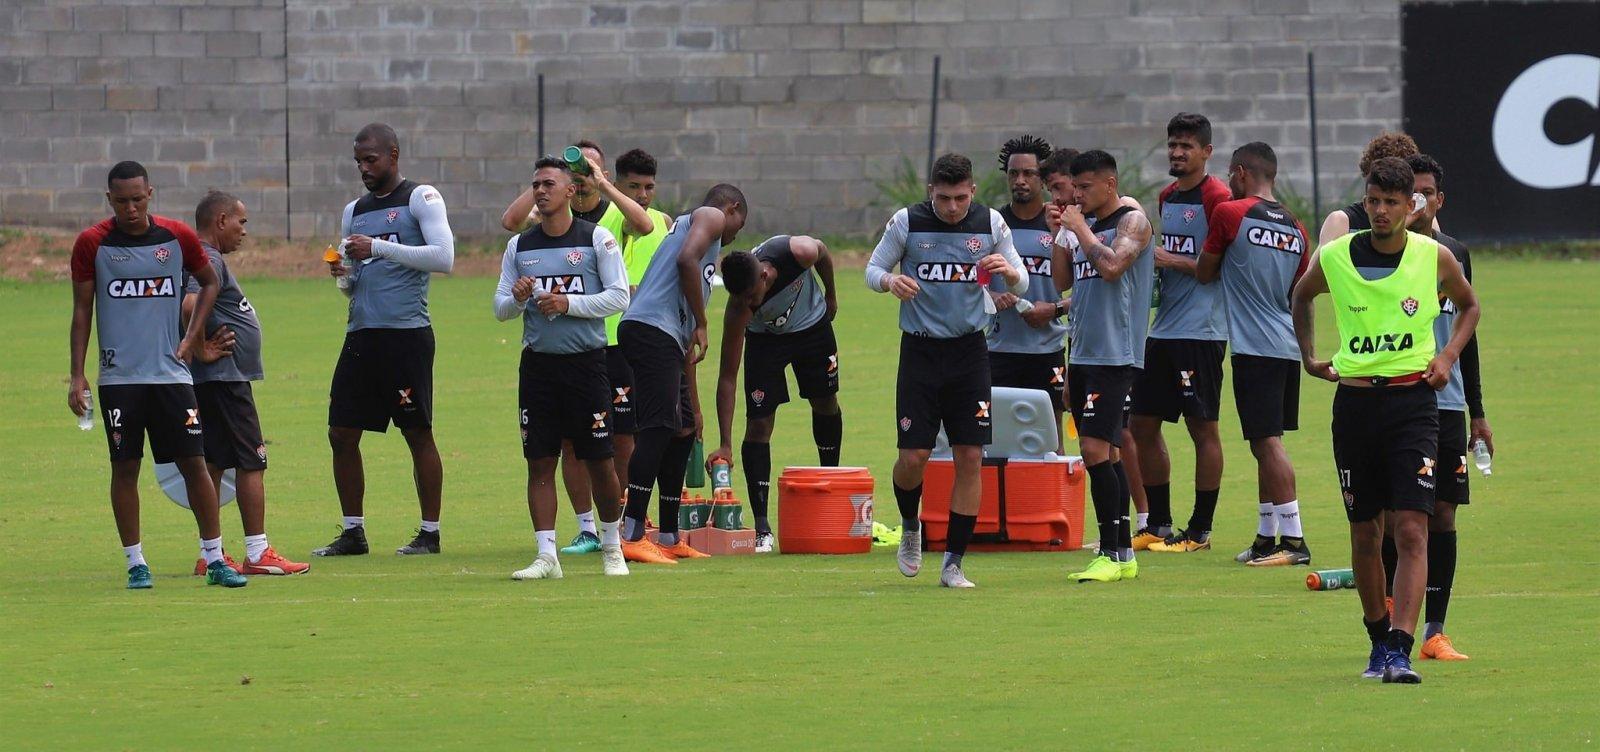 [Com desfalques e goleiro barrado, Burse relaciona 22 para enfrentar o Cruzeiro]